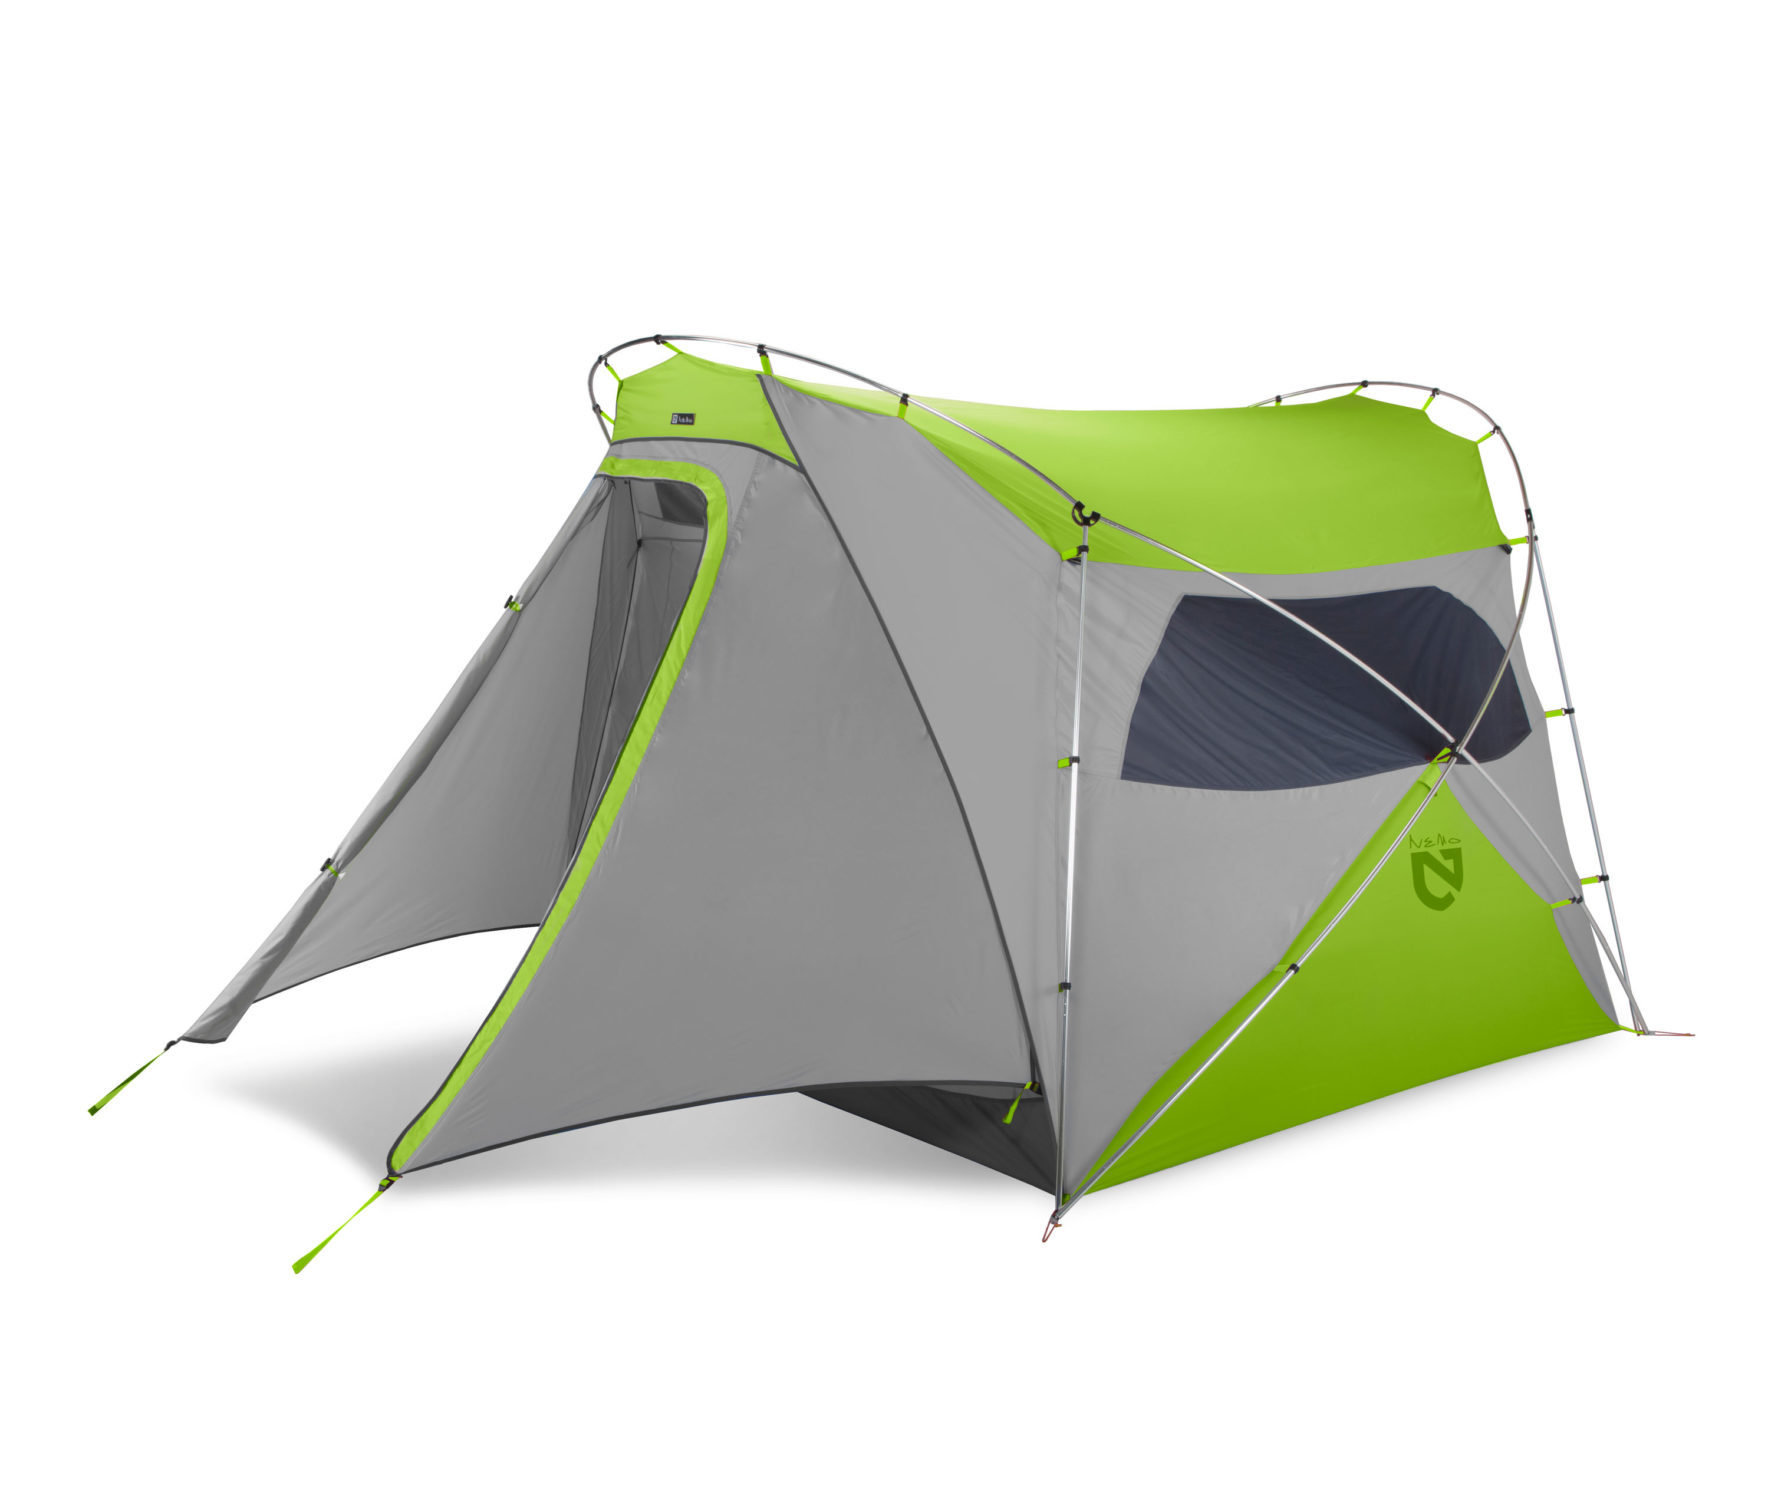 NEMO Wagontop Camping Tent JR1nWT4p